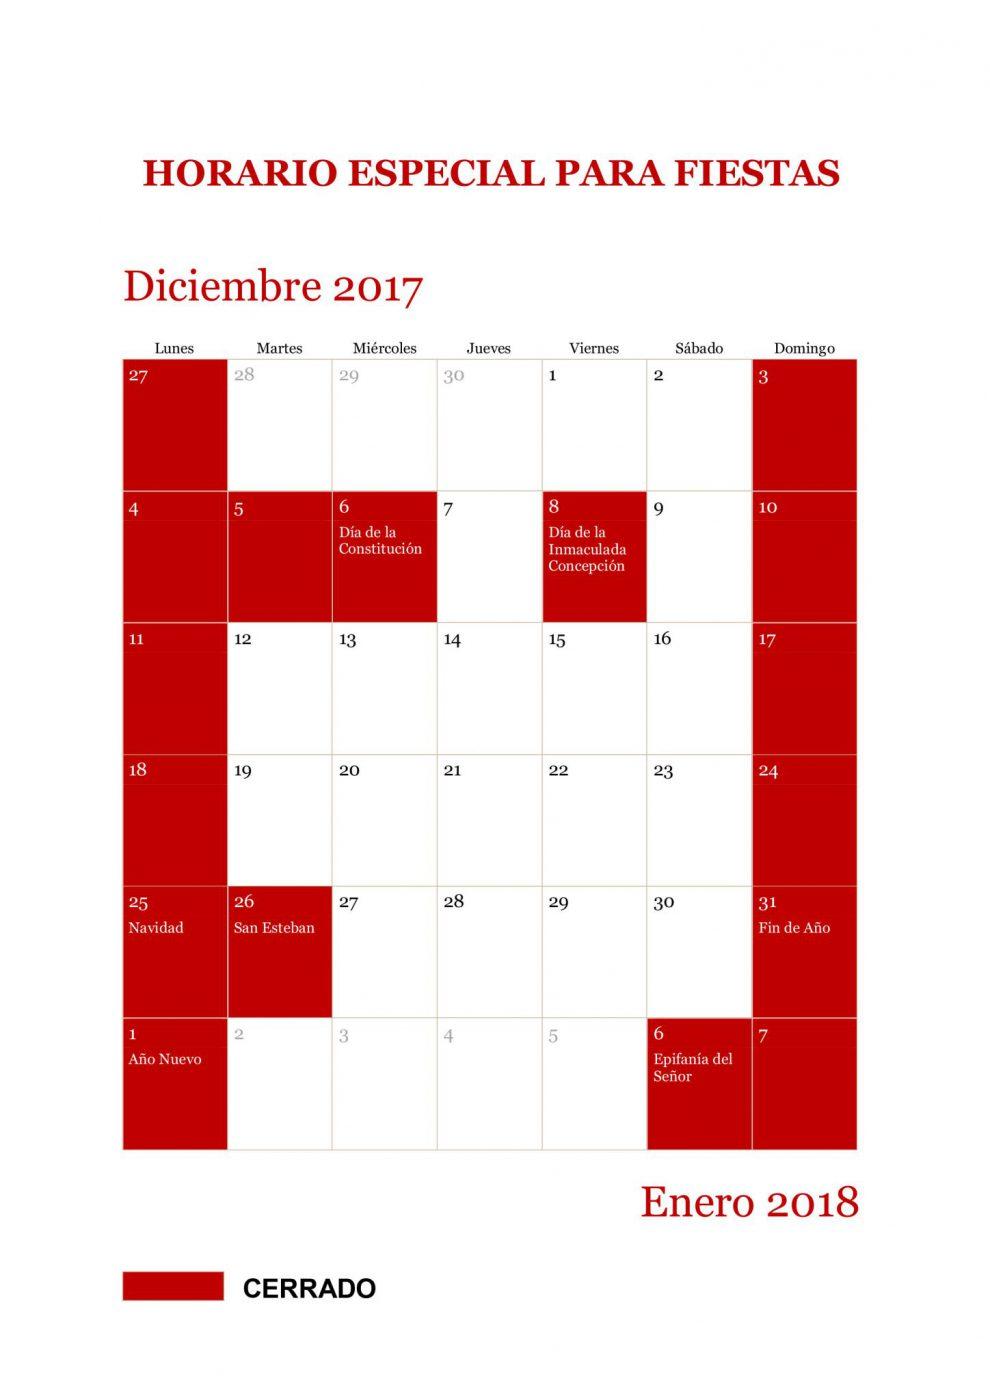 Horario fiestas 2017-2018